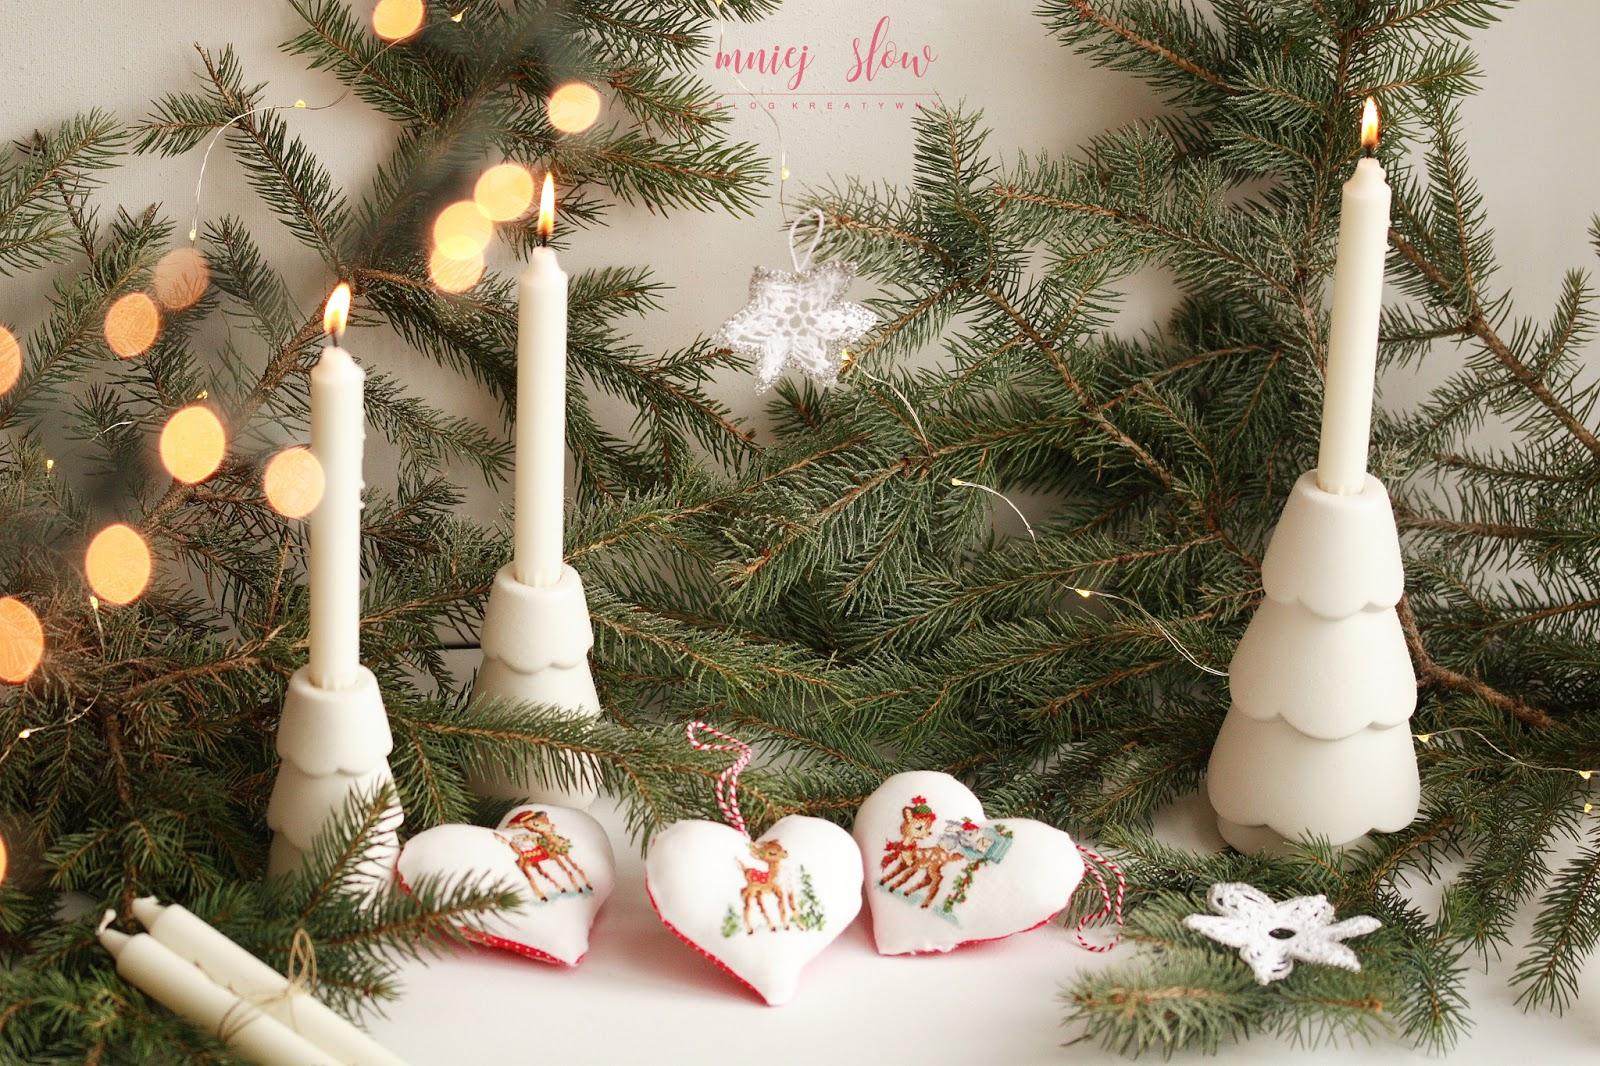 La magie de Noël #2, La grande histoire de Noël #2, Le calendrier de l'avent #2, La grande histoire des Cartes de vœux #2, La grande histoire des mini-motifs de Noël